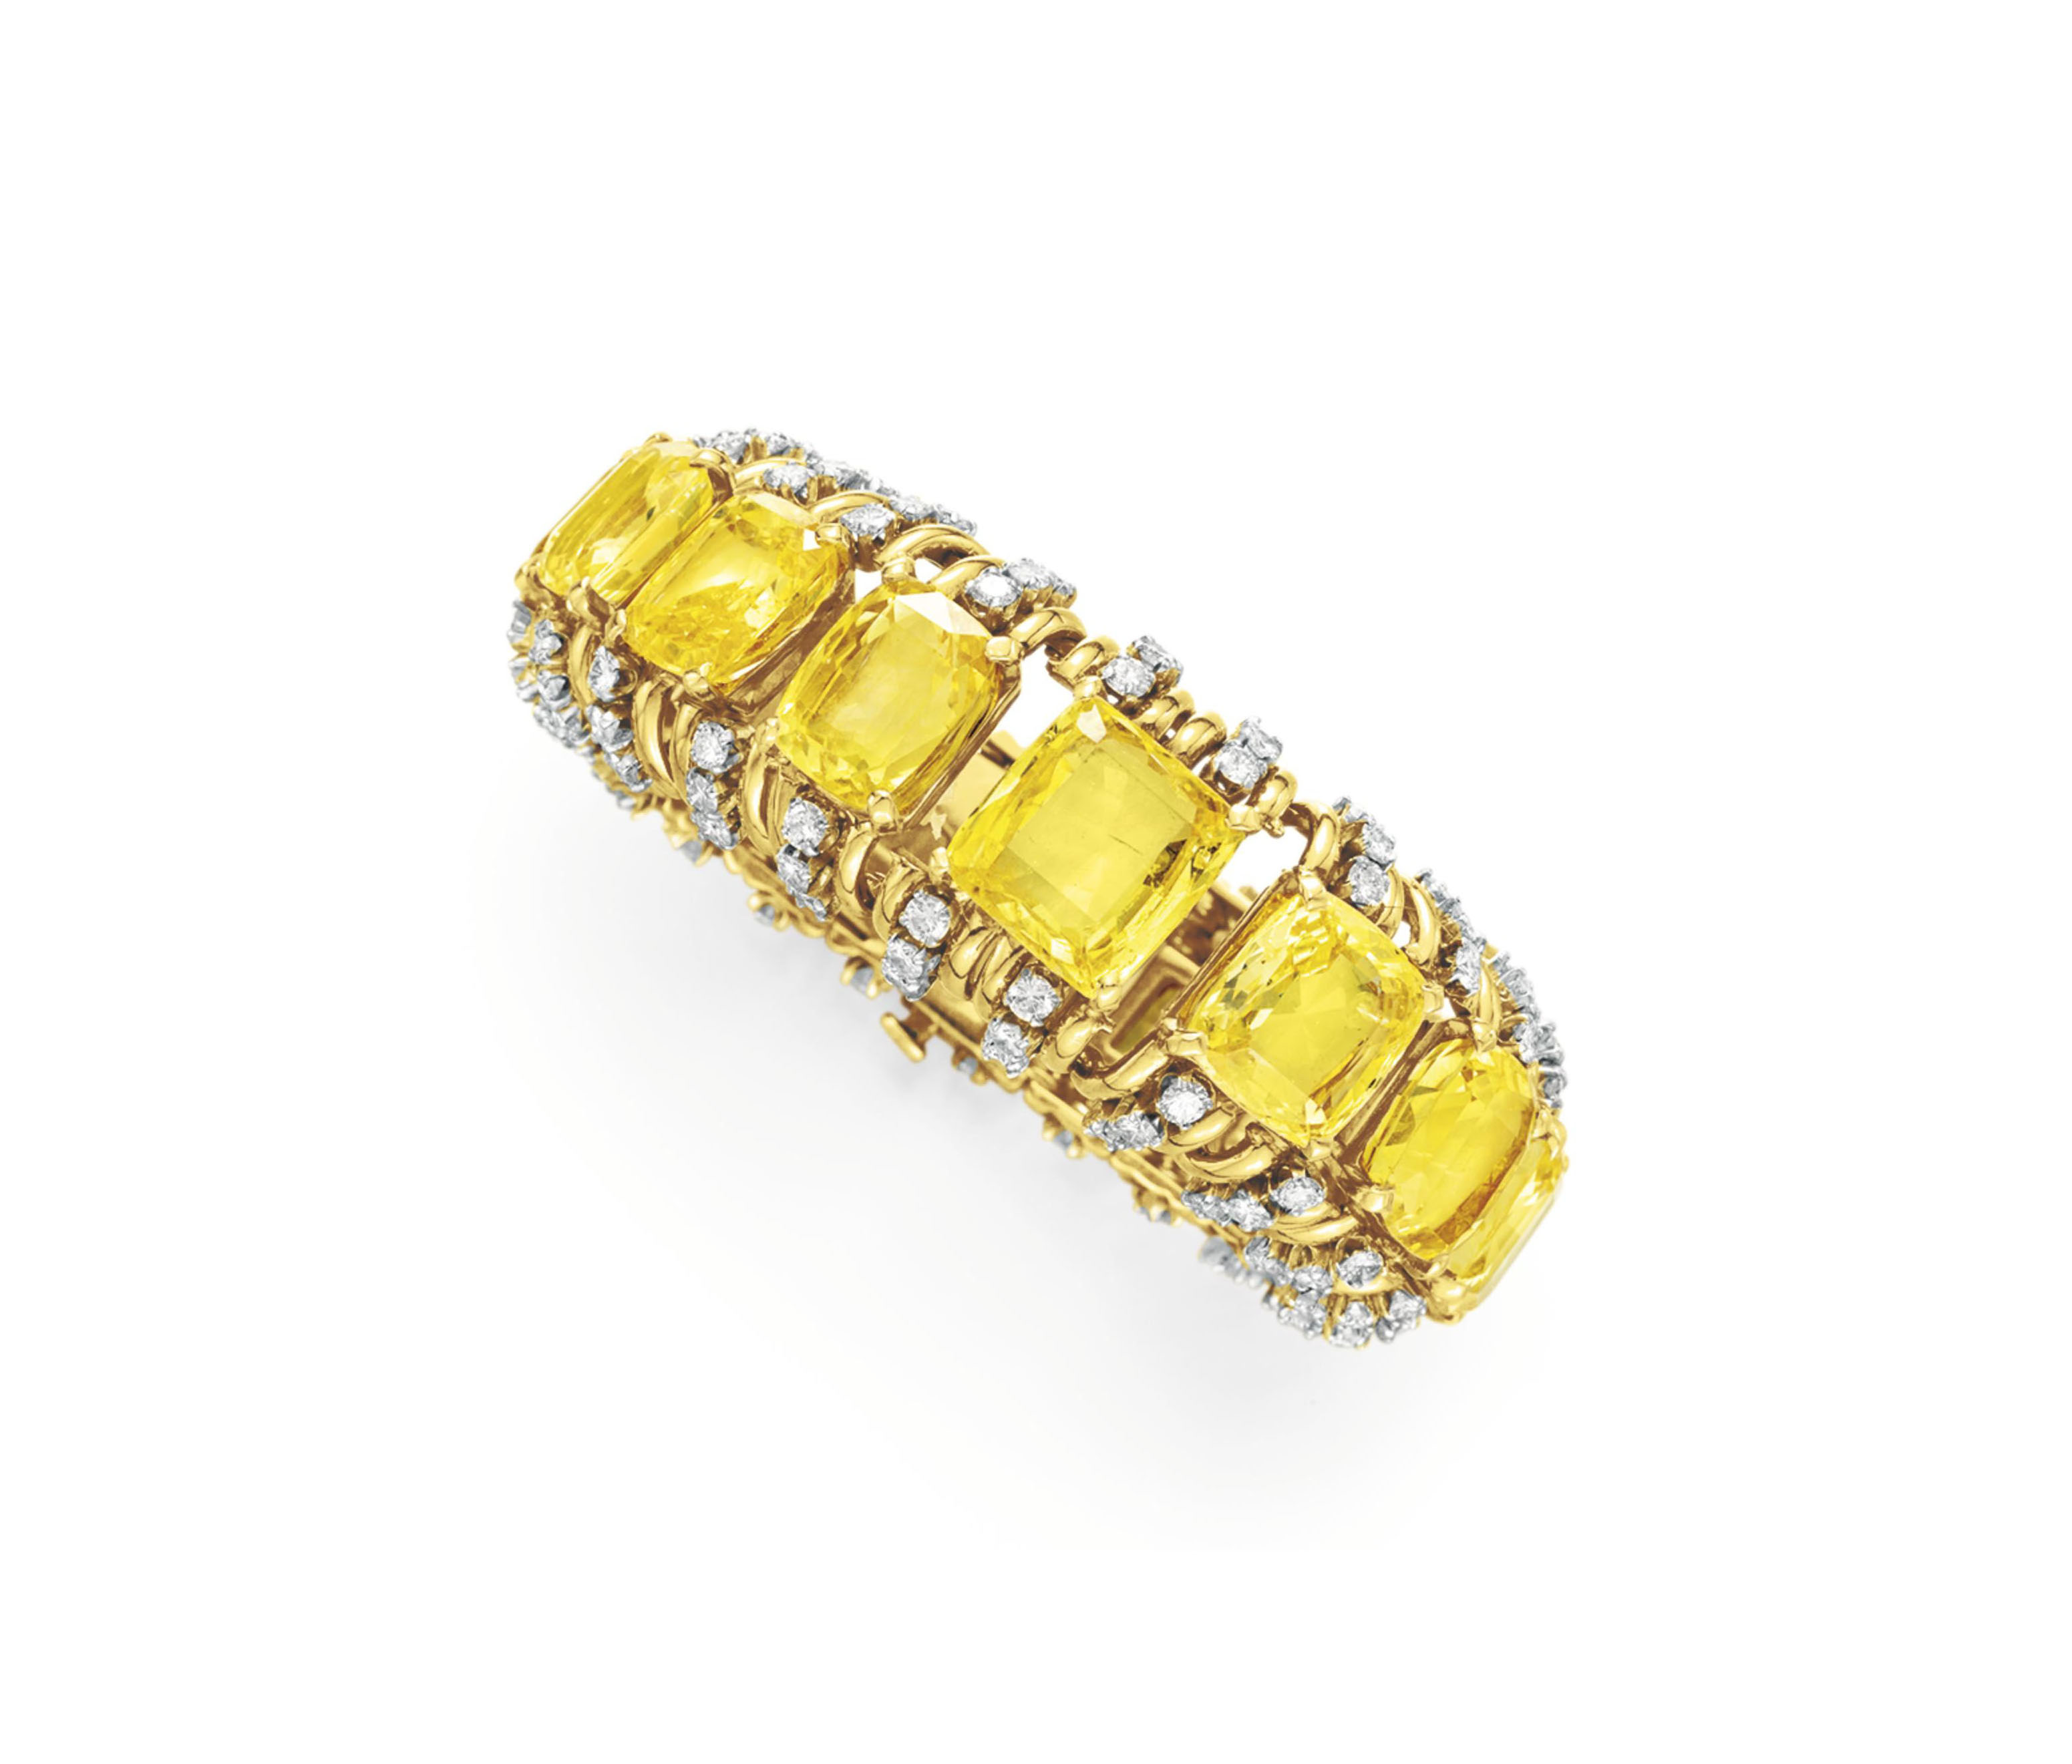 A YELLOW SAPPHIRE AND DIAMOND BRACELET, BY VERDURA